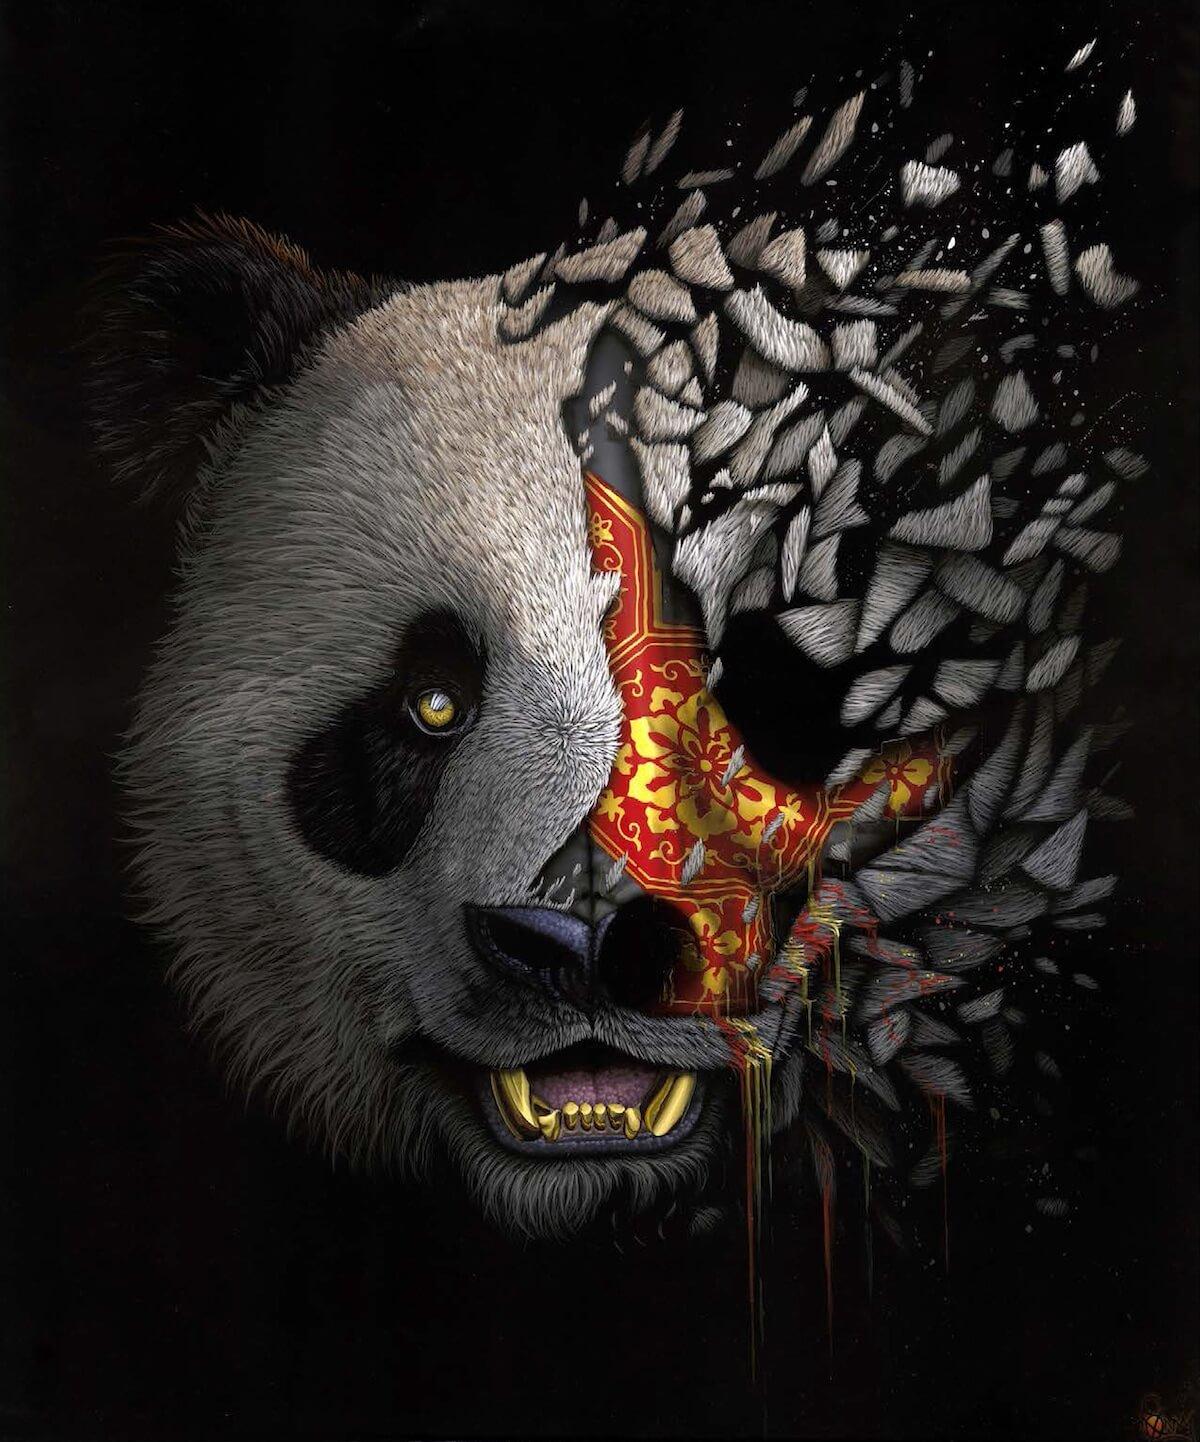 sonny animal paintings street animals endangered artist species panda awareness speaks history lives help giant advertisement